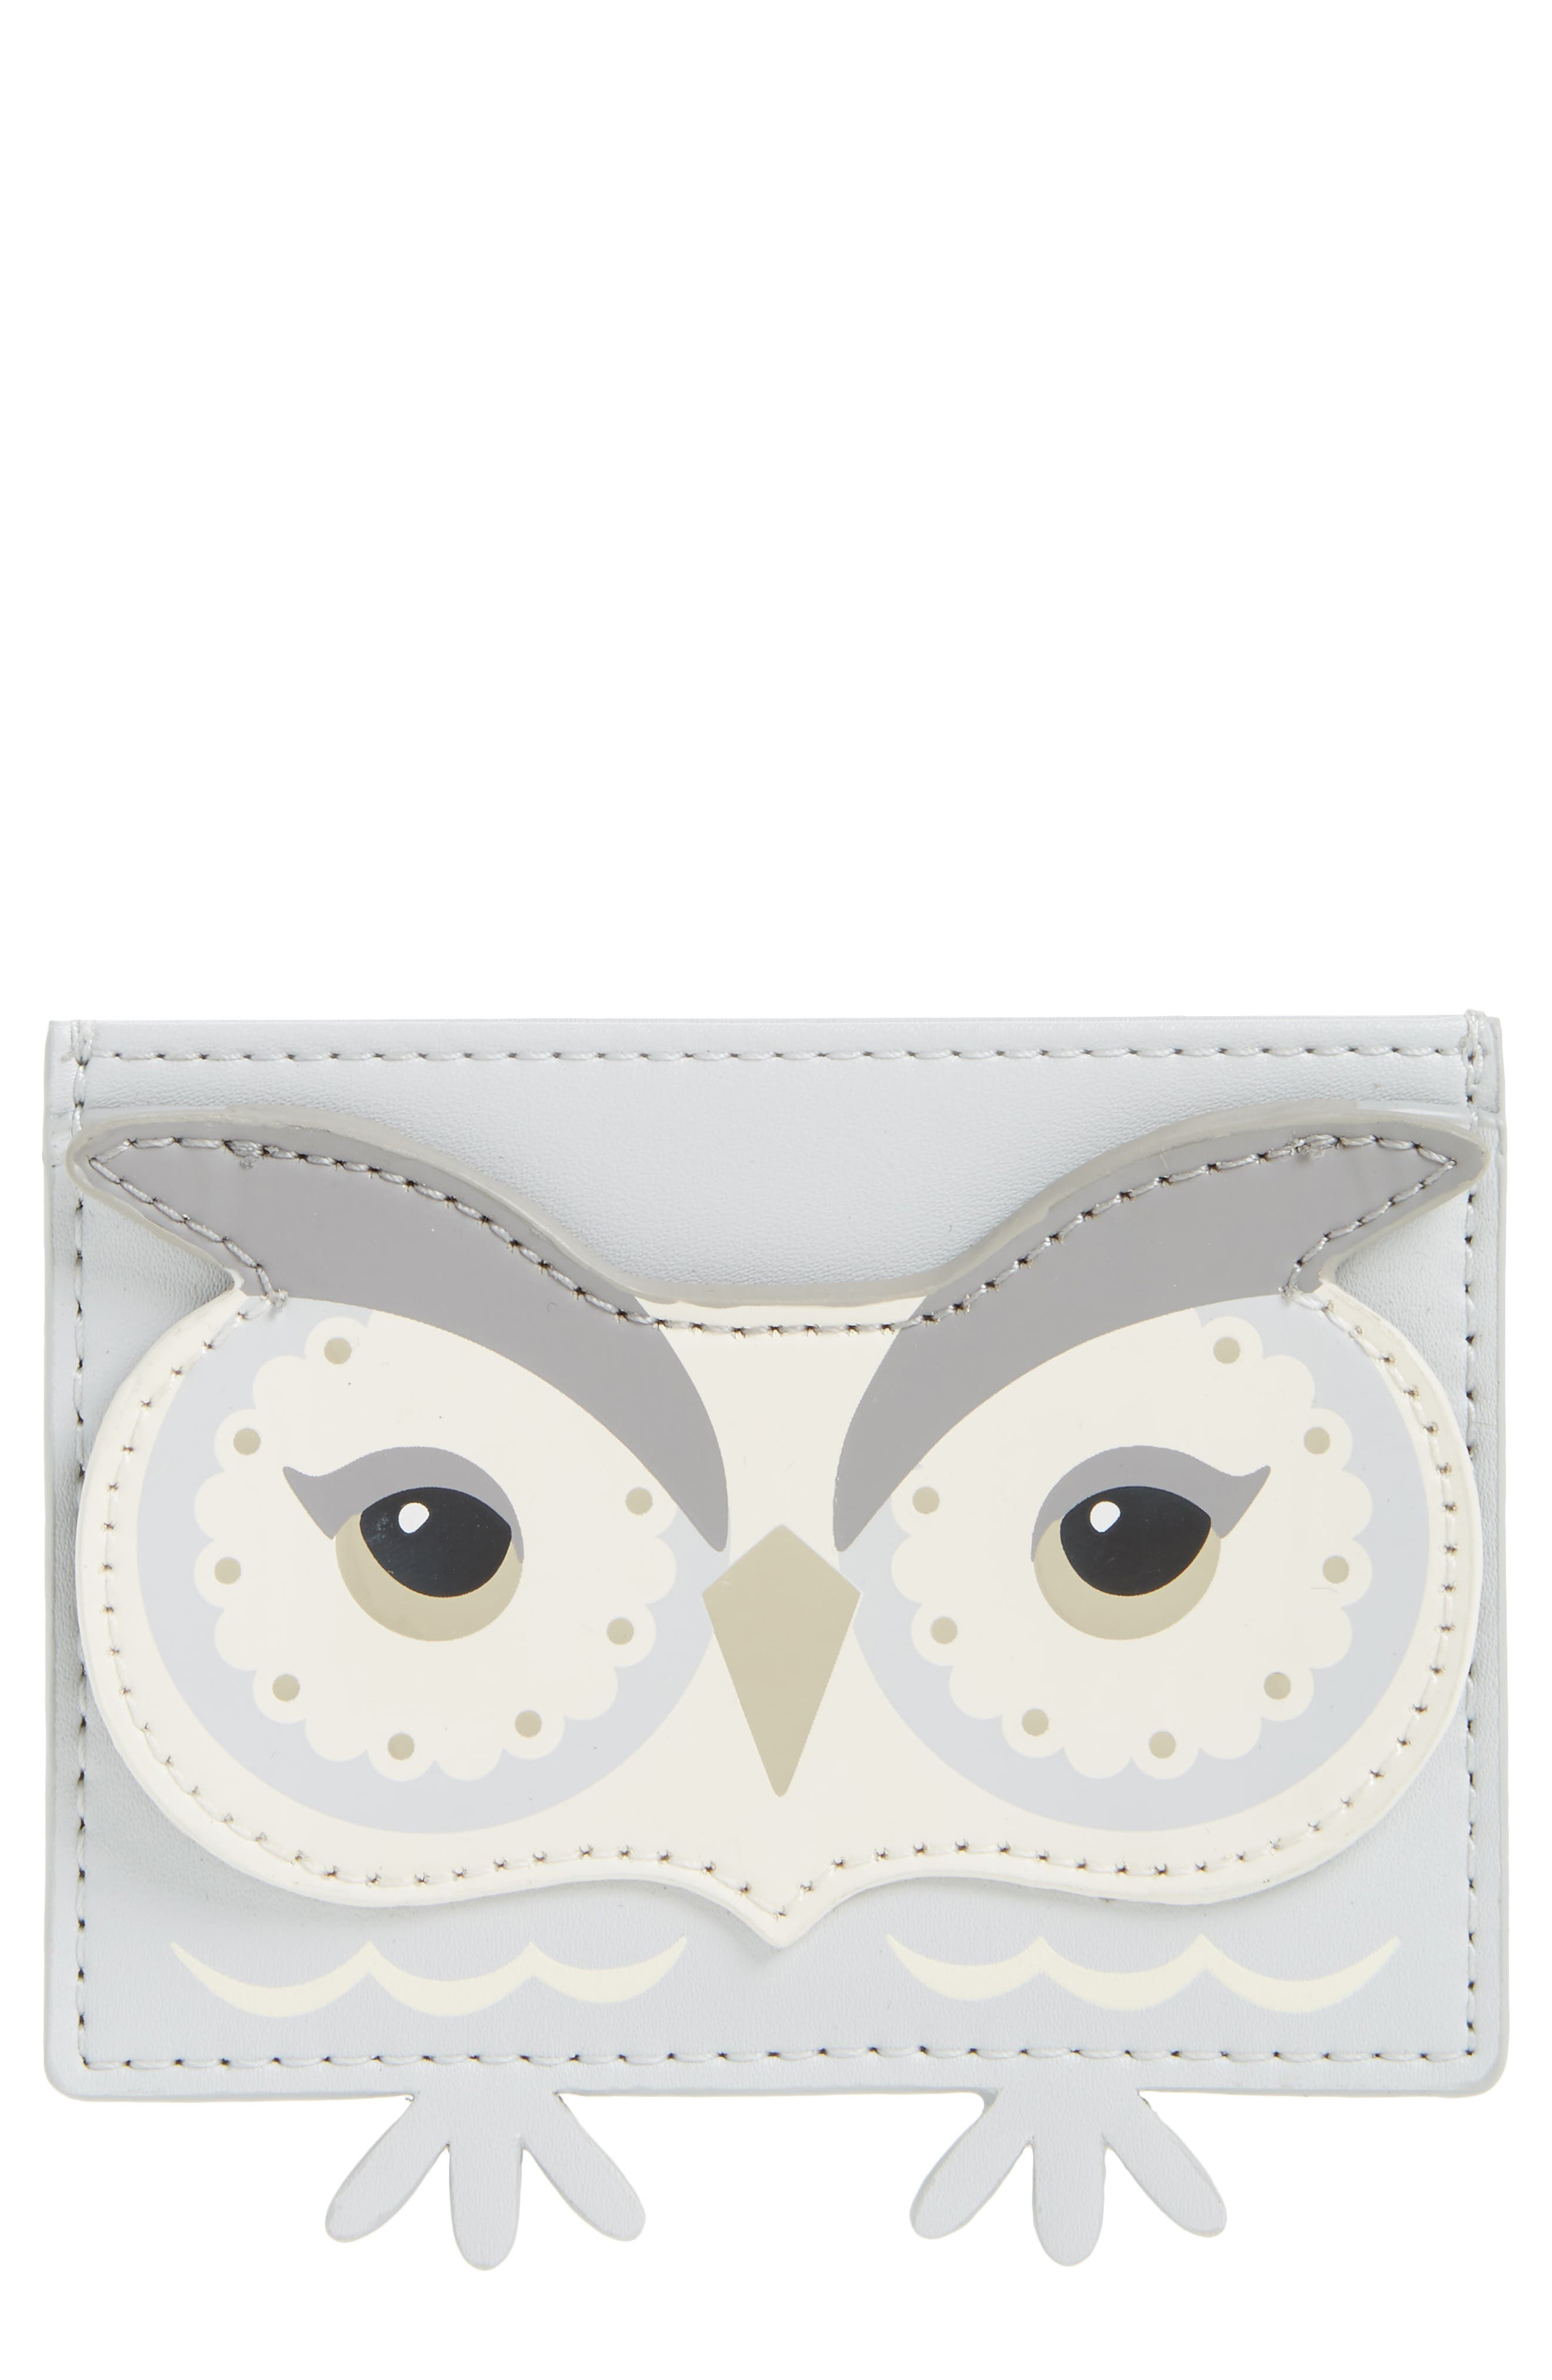 Main Image - kate spade new york starbright owl leather card holder